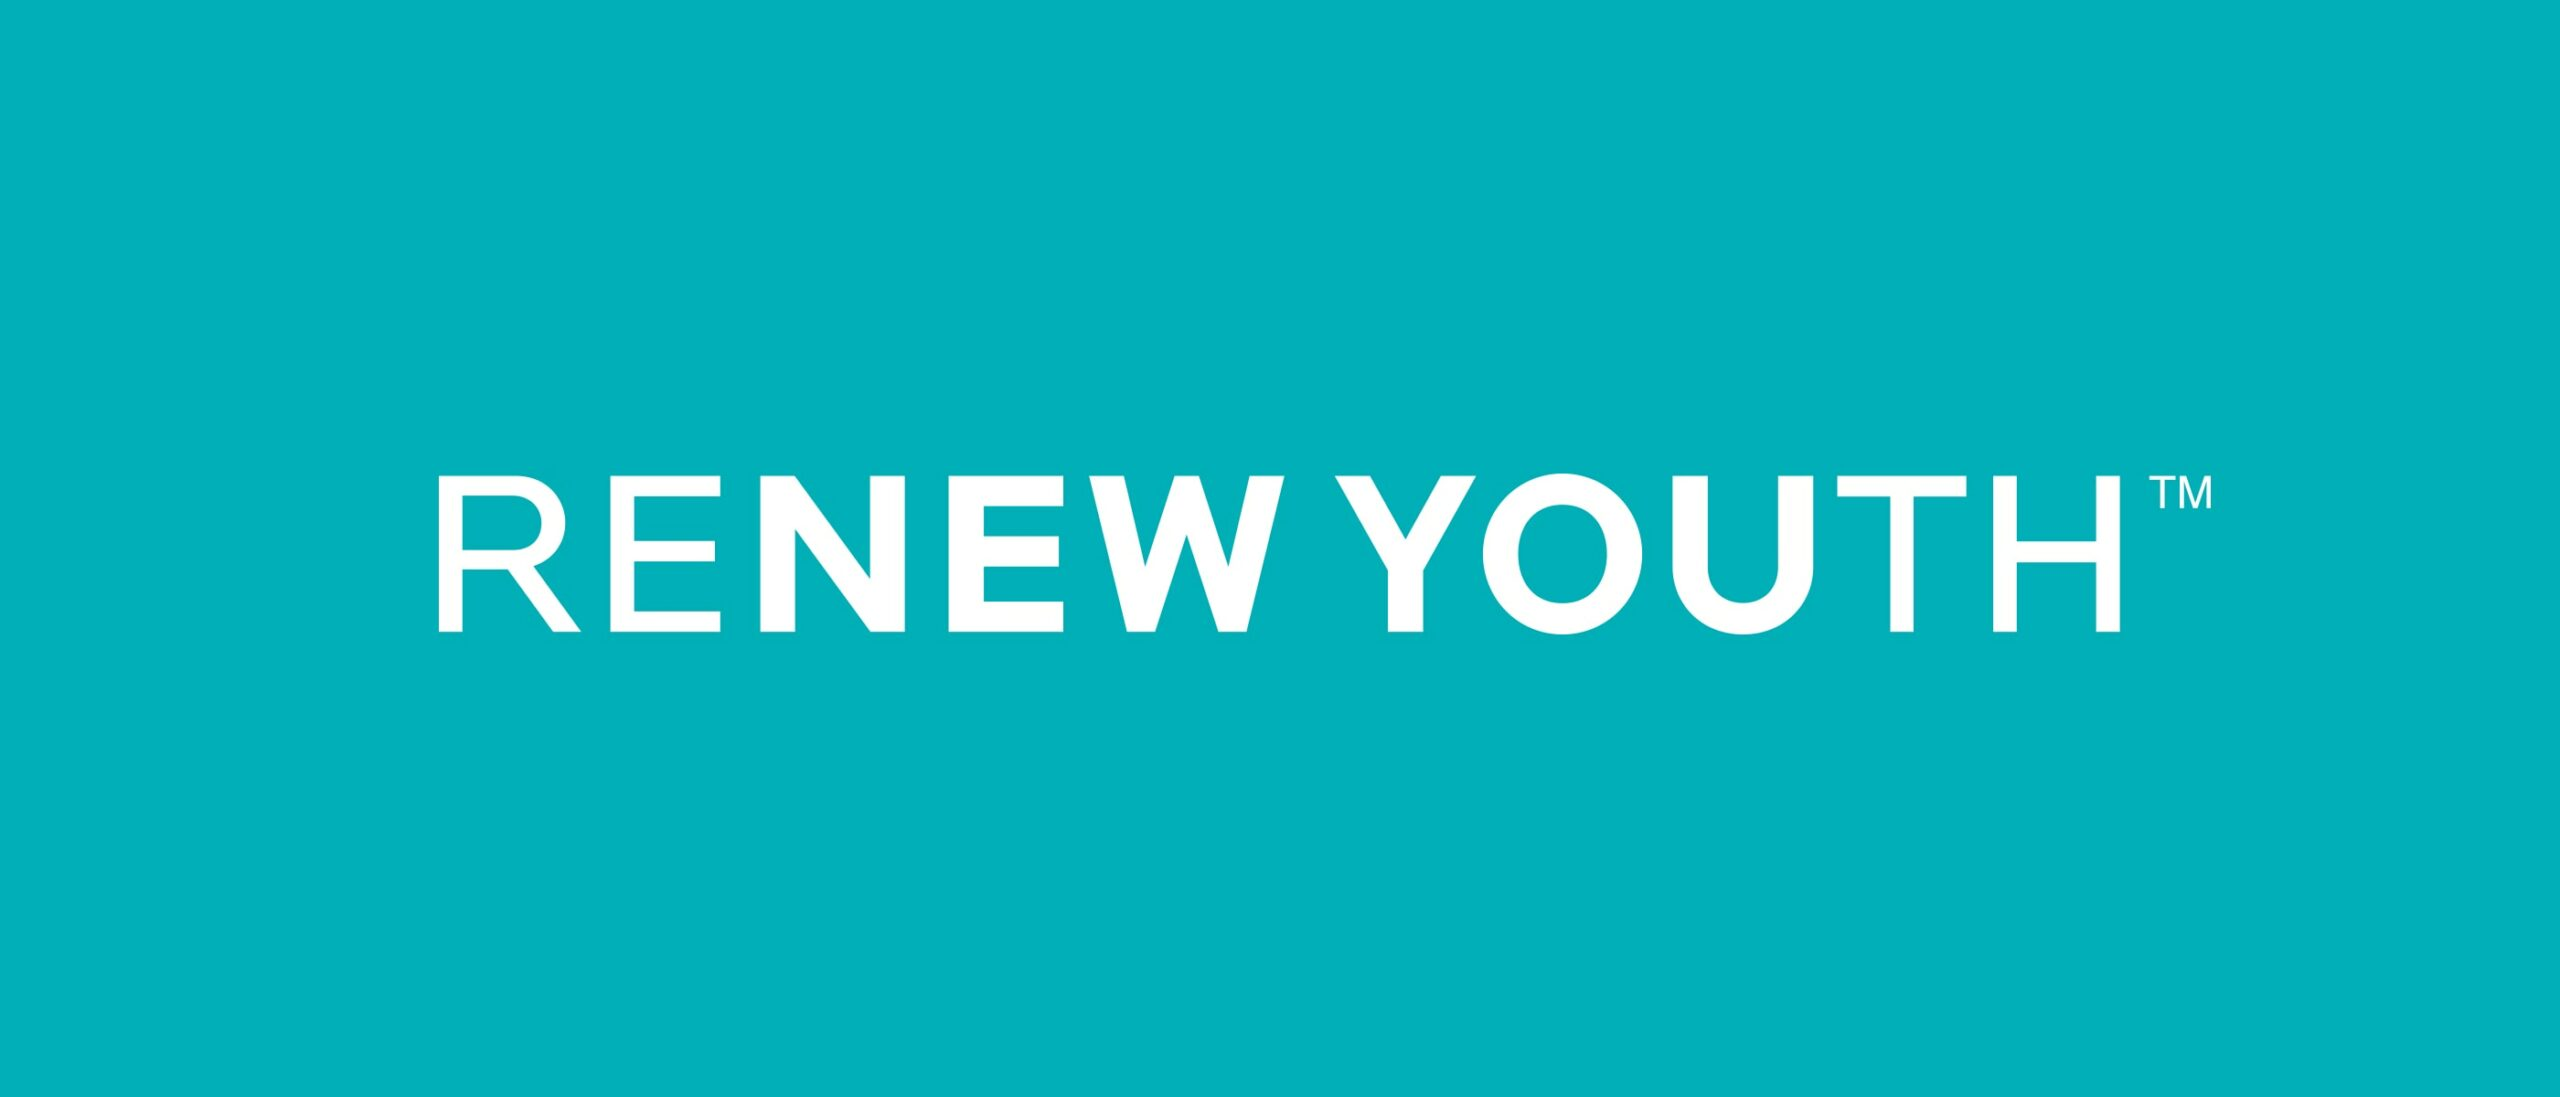 Renew Youth Logo Reversed